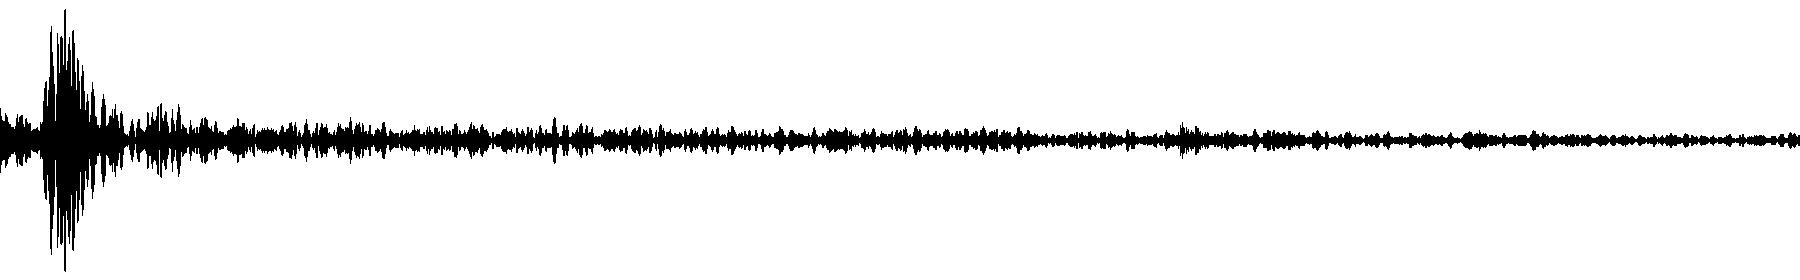 biab glitchhop blip 10